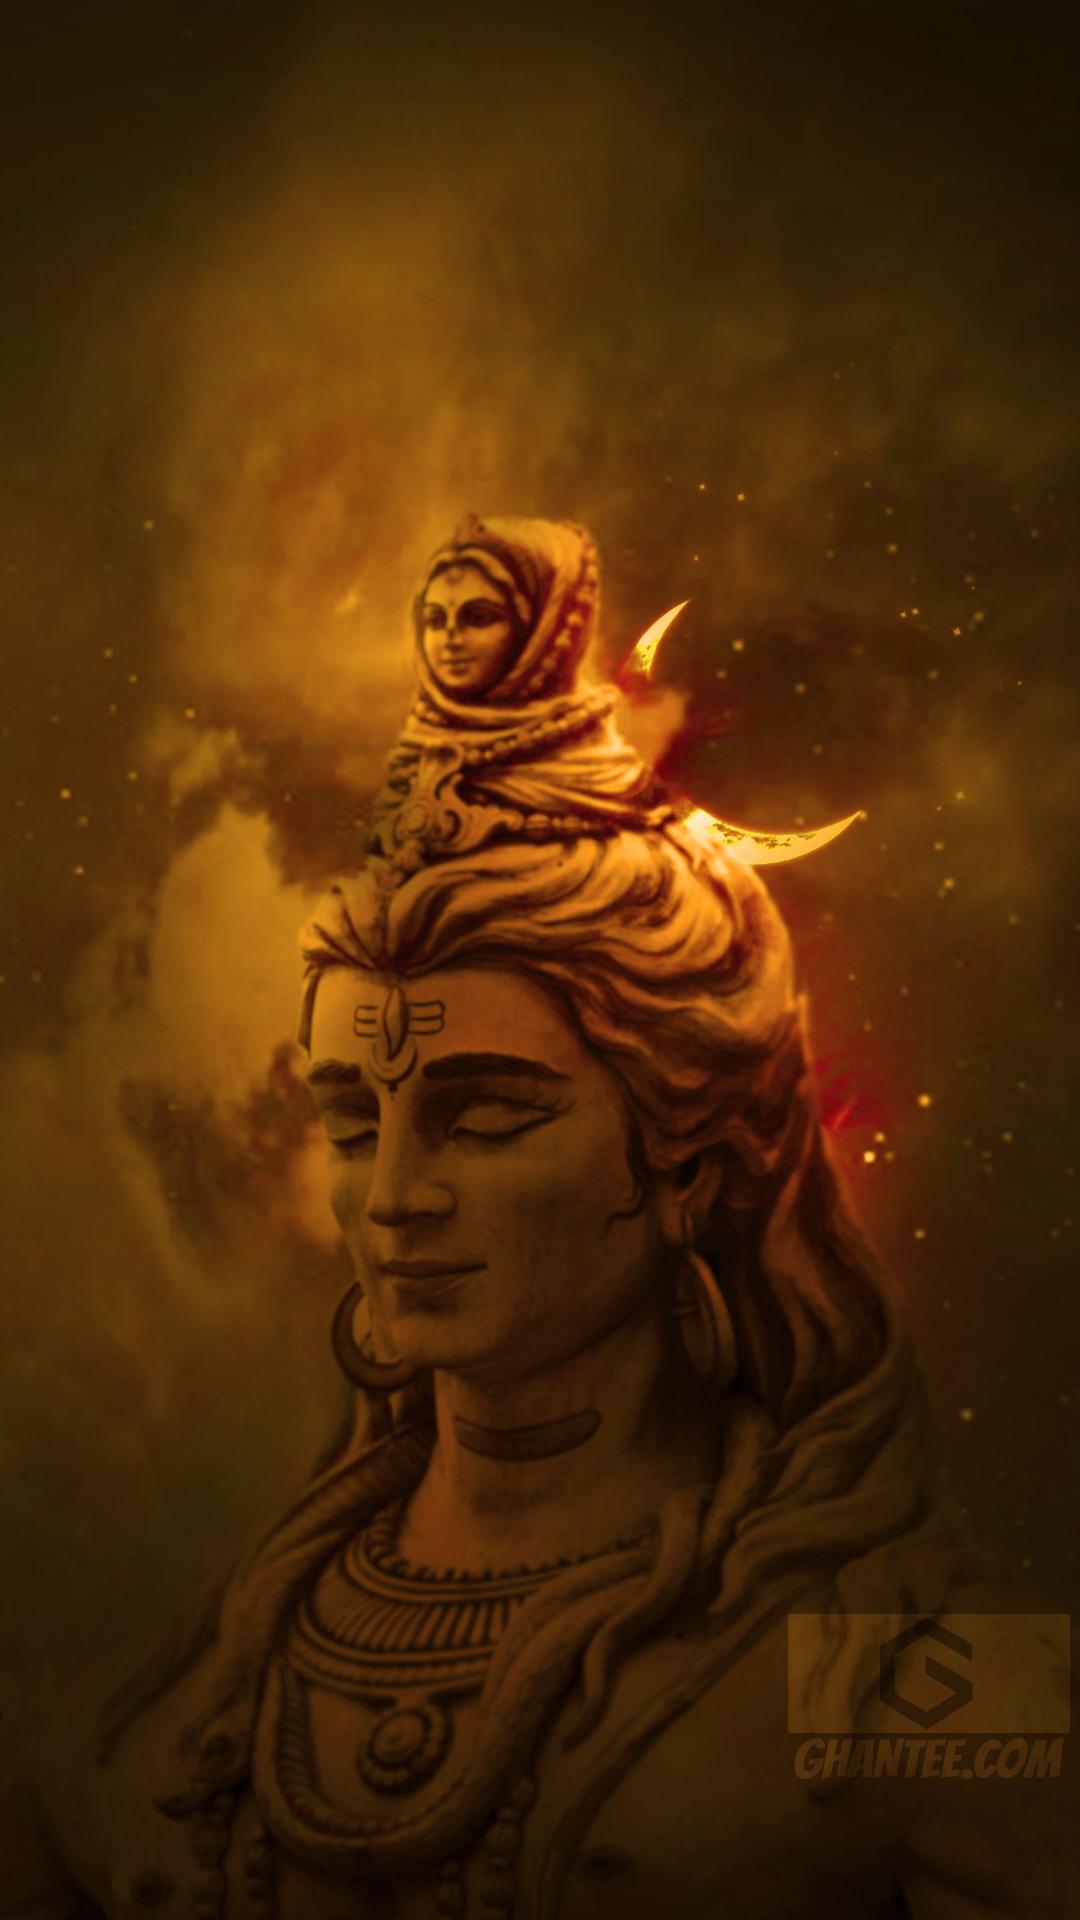 lord shiva face hd phone wallpaper